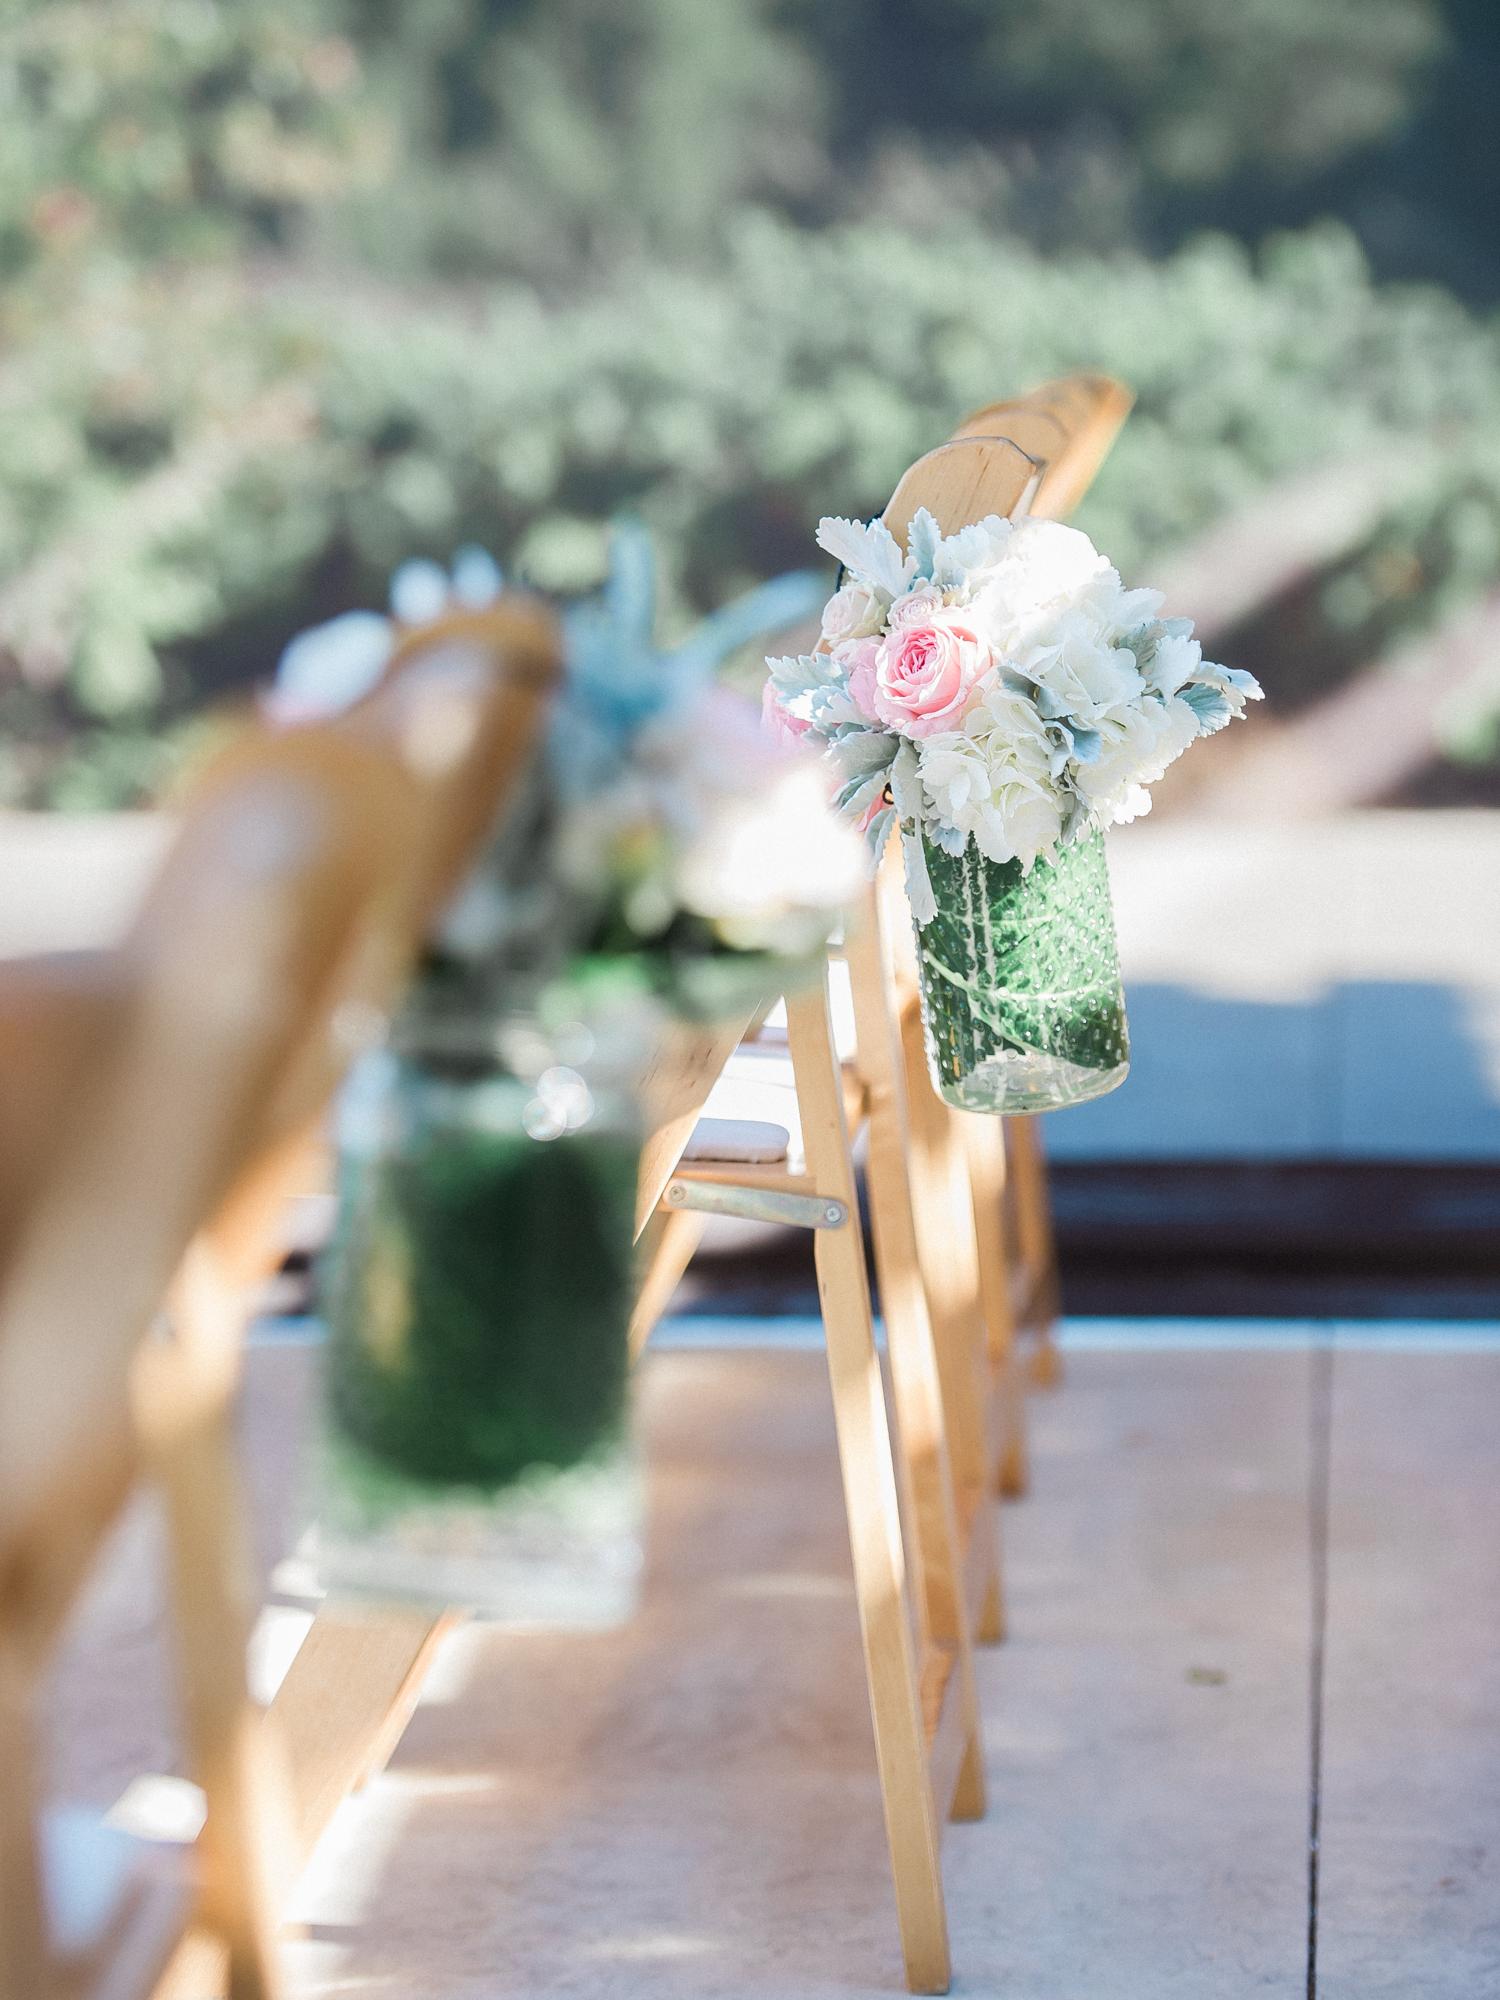 Aimee+Logan_wedding_spp-75.jpg